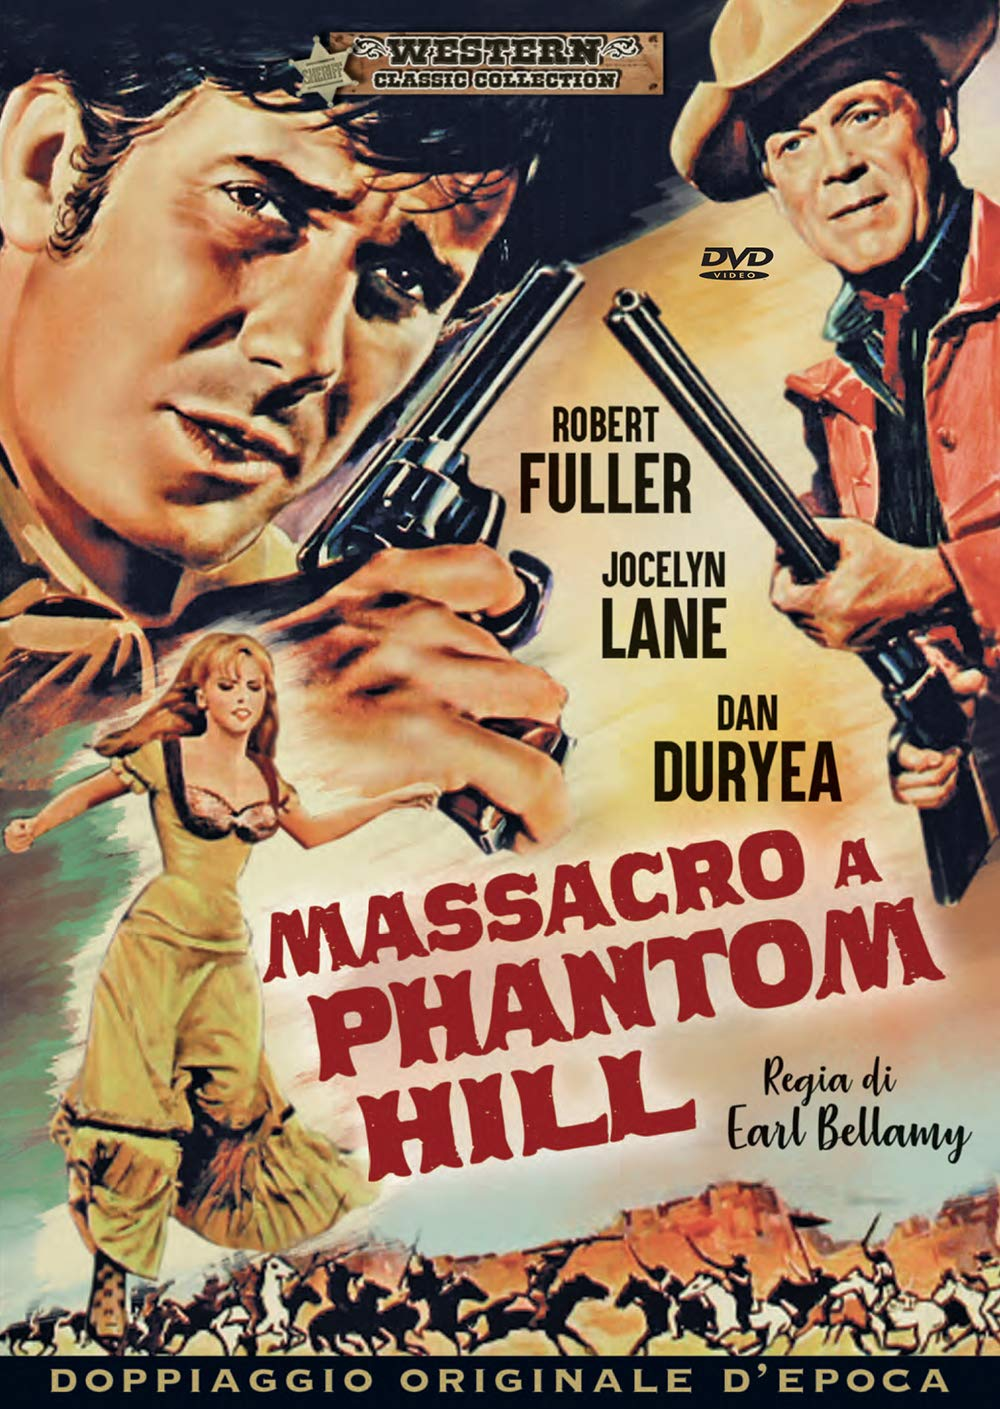 MASSACRO A PHANTOM HILL (DVD)